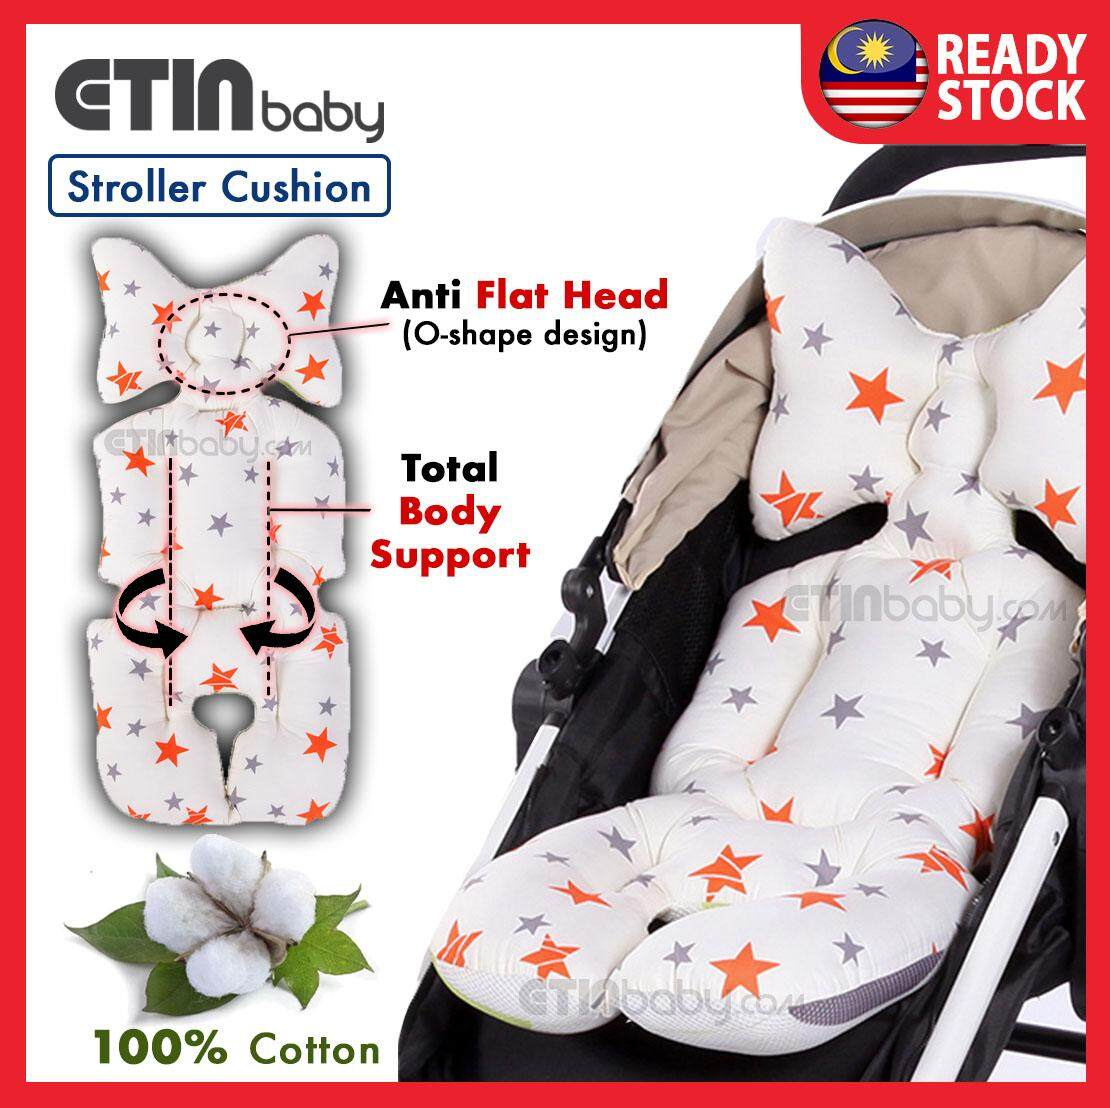 Portable Car Seat Chair Baby Stroller Cushion Pad High Quality Soft Cotton